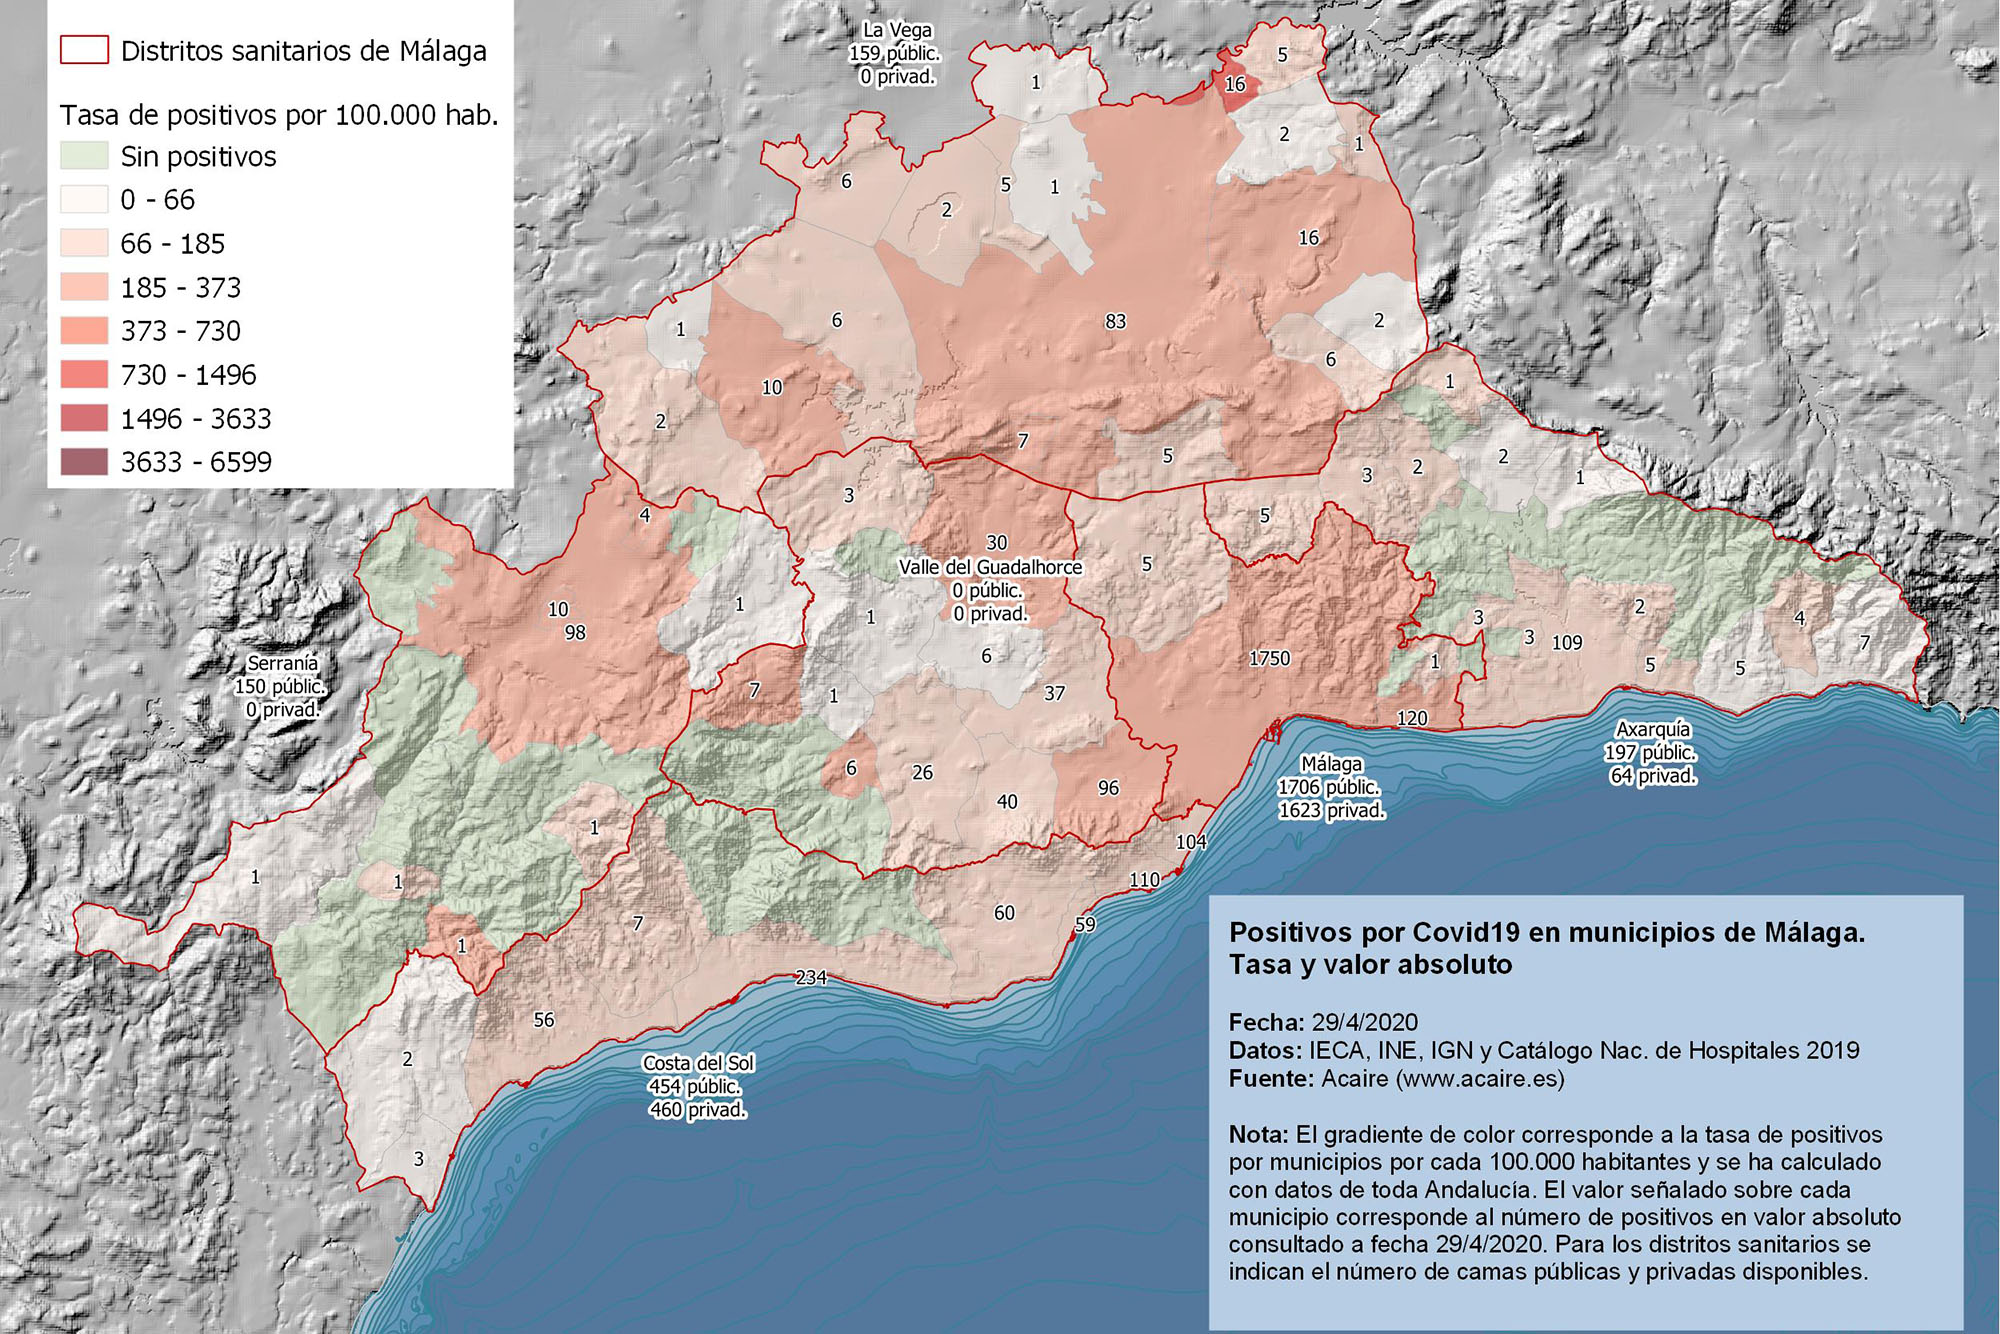 Índice de ruralidad municipios de Málaga